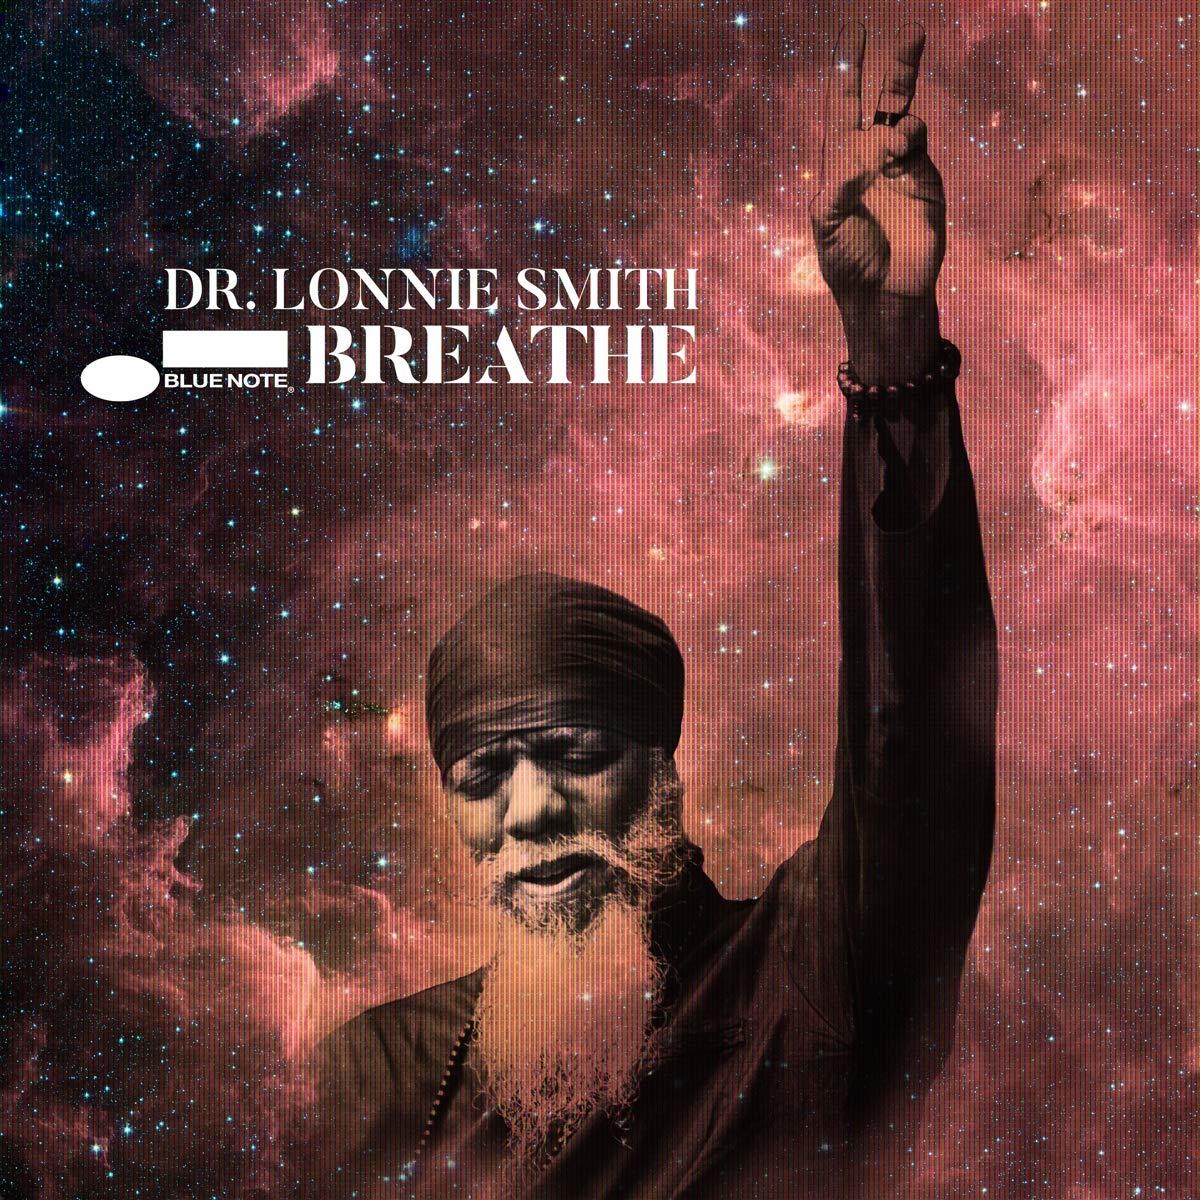 DR LONNIE SMITH - Breathe cover